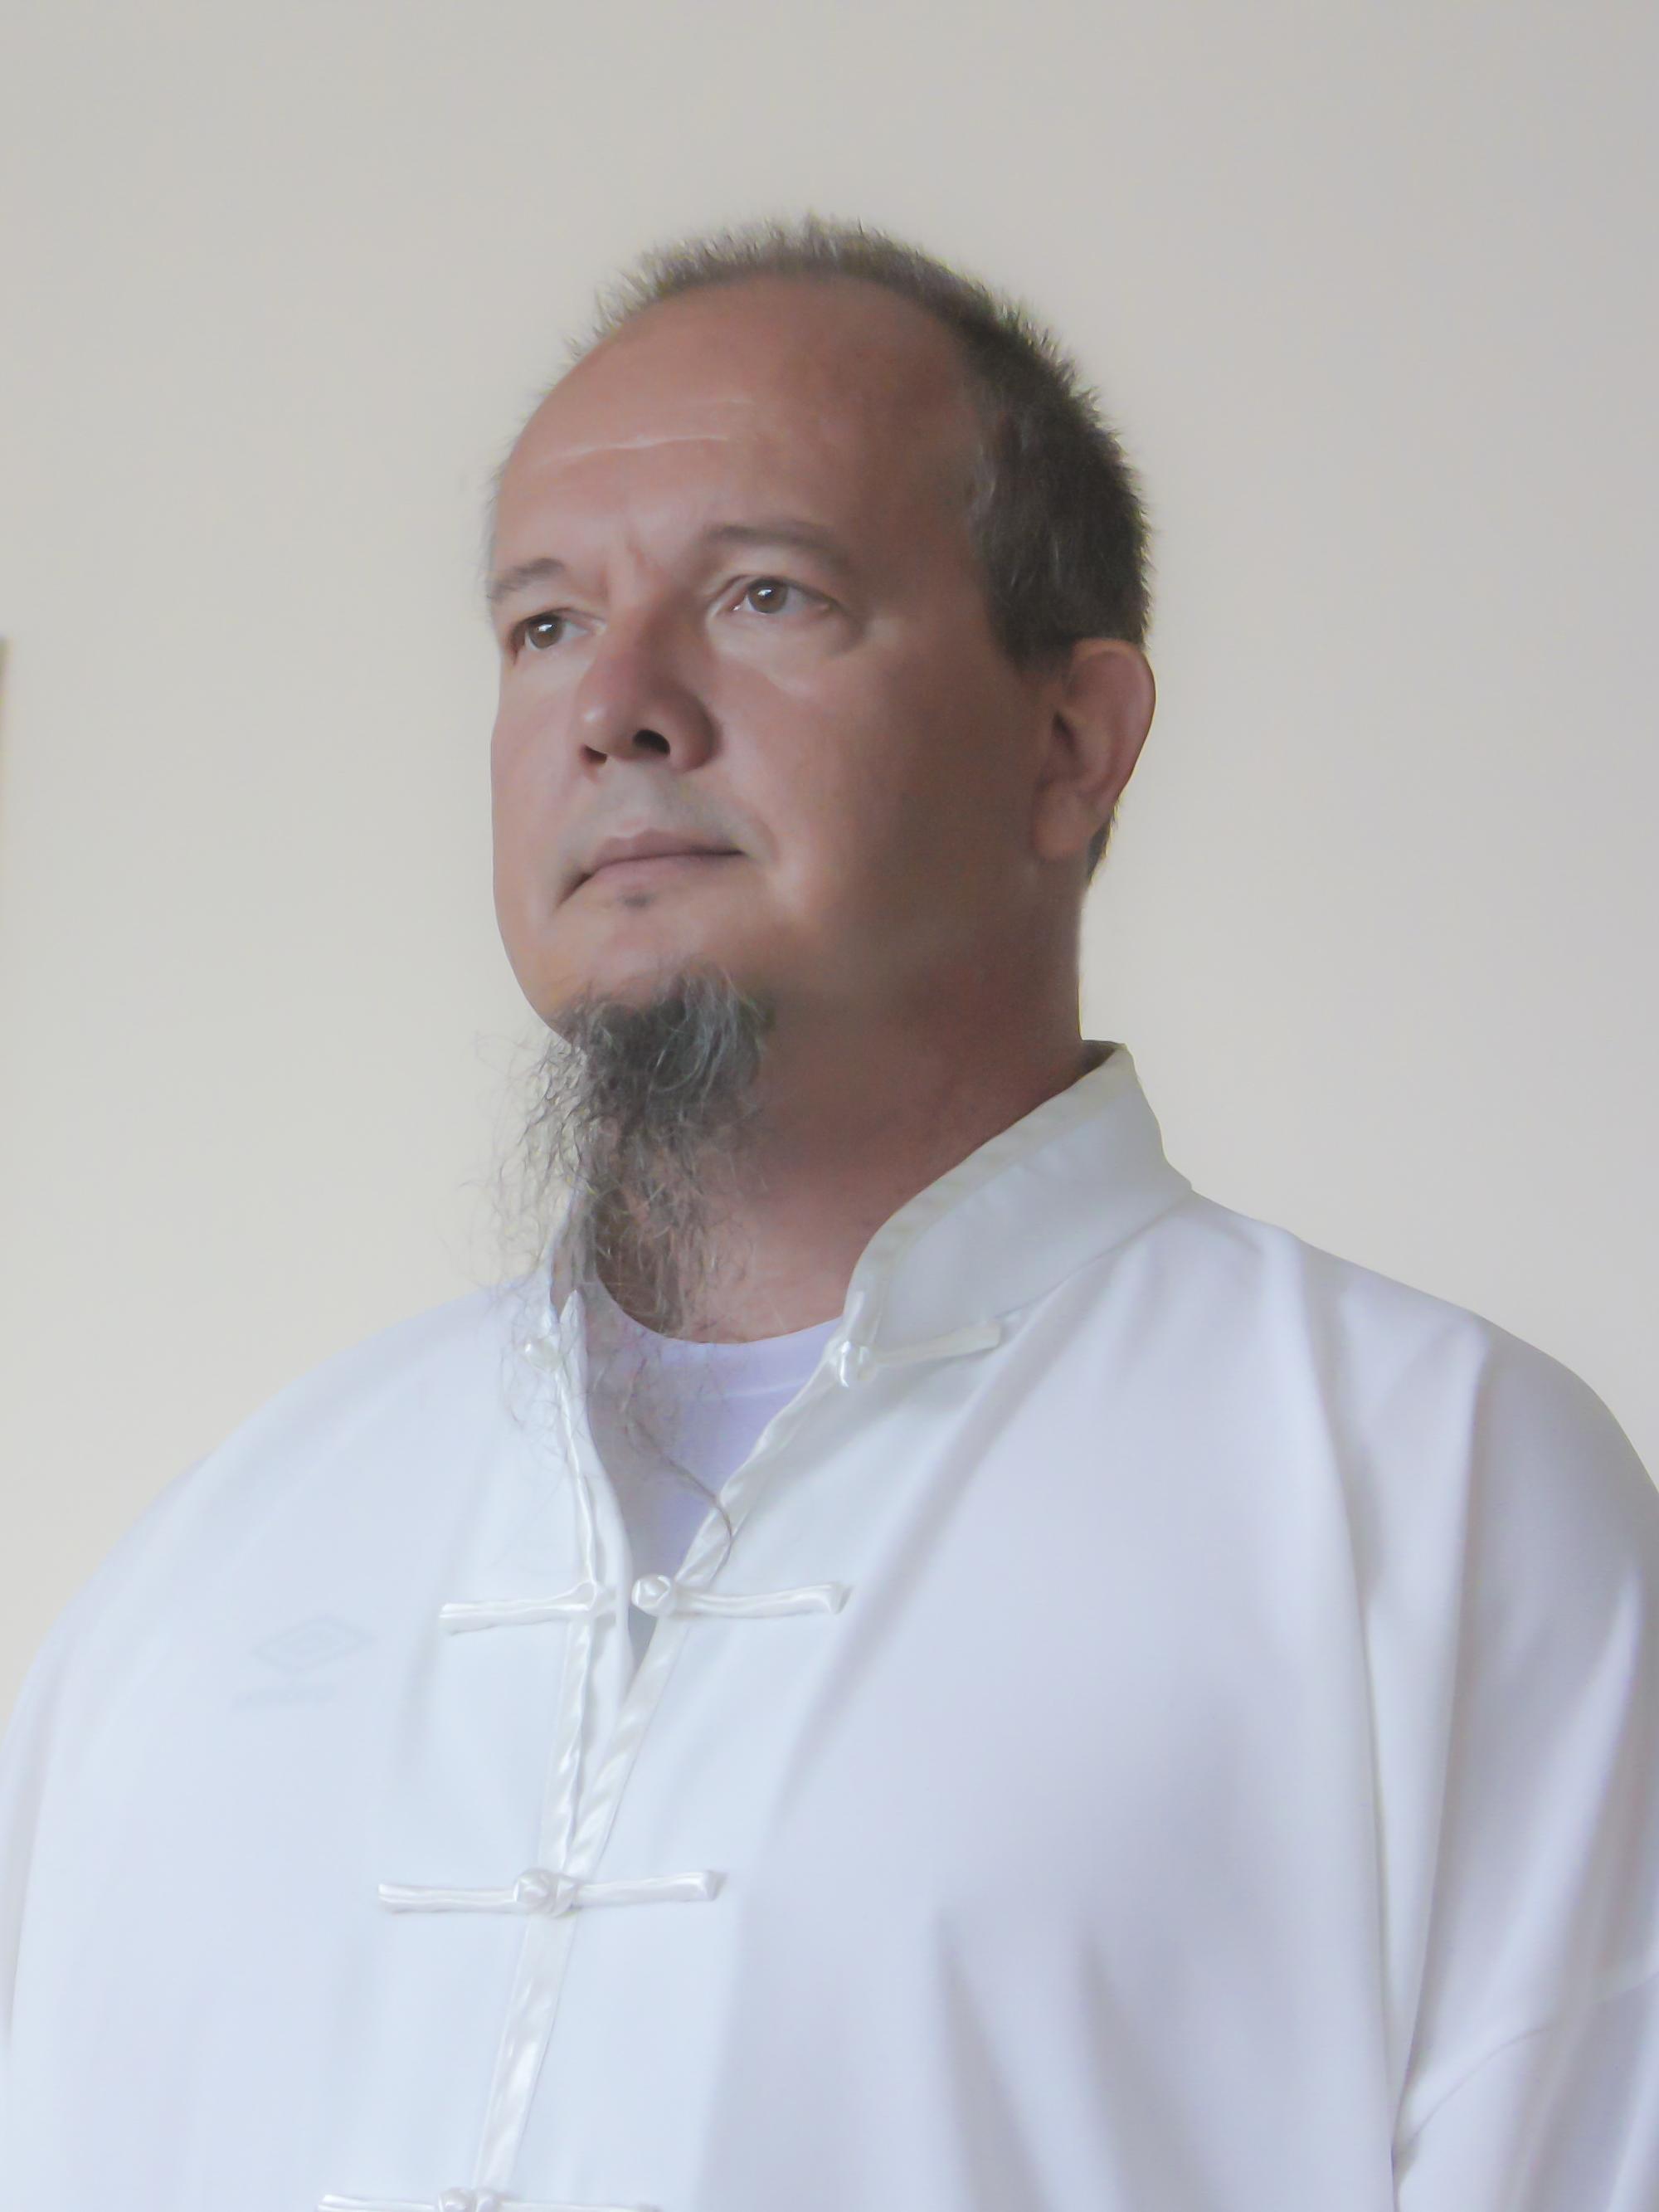 Dušan Strapec